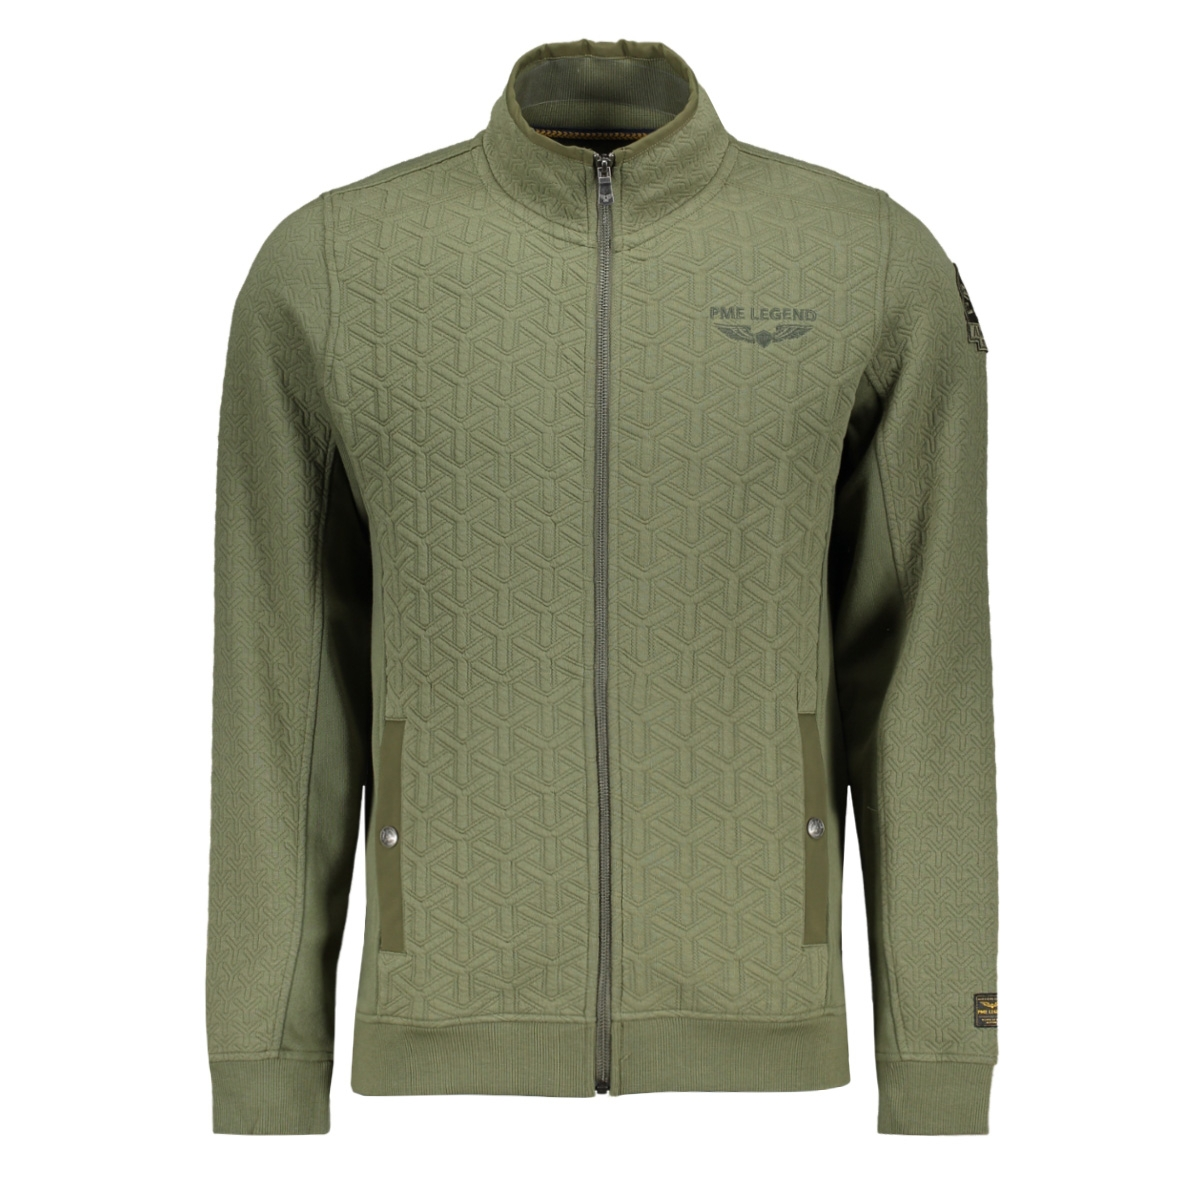 zip jacket structure sweater psw201402 pme legend vest 6149